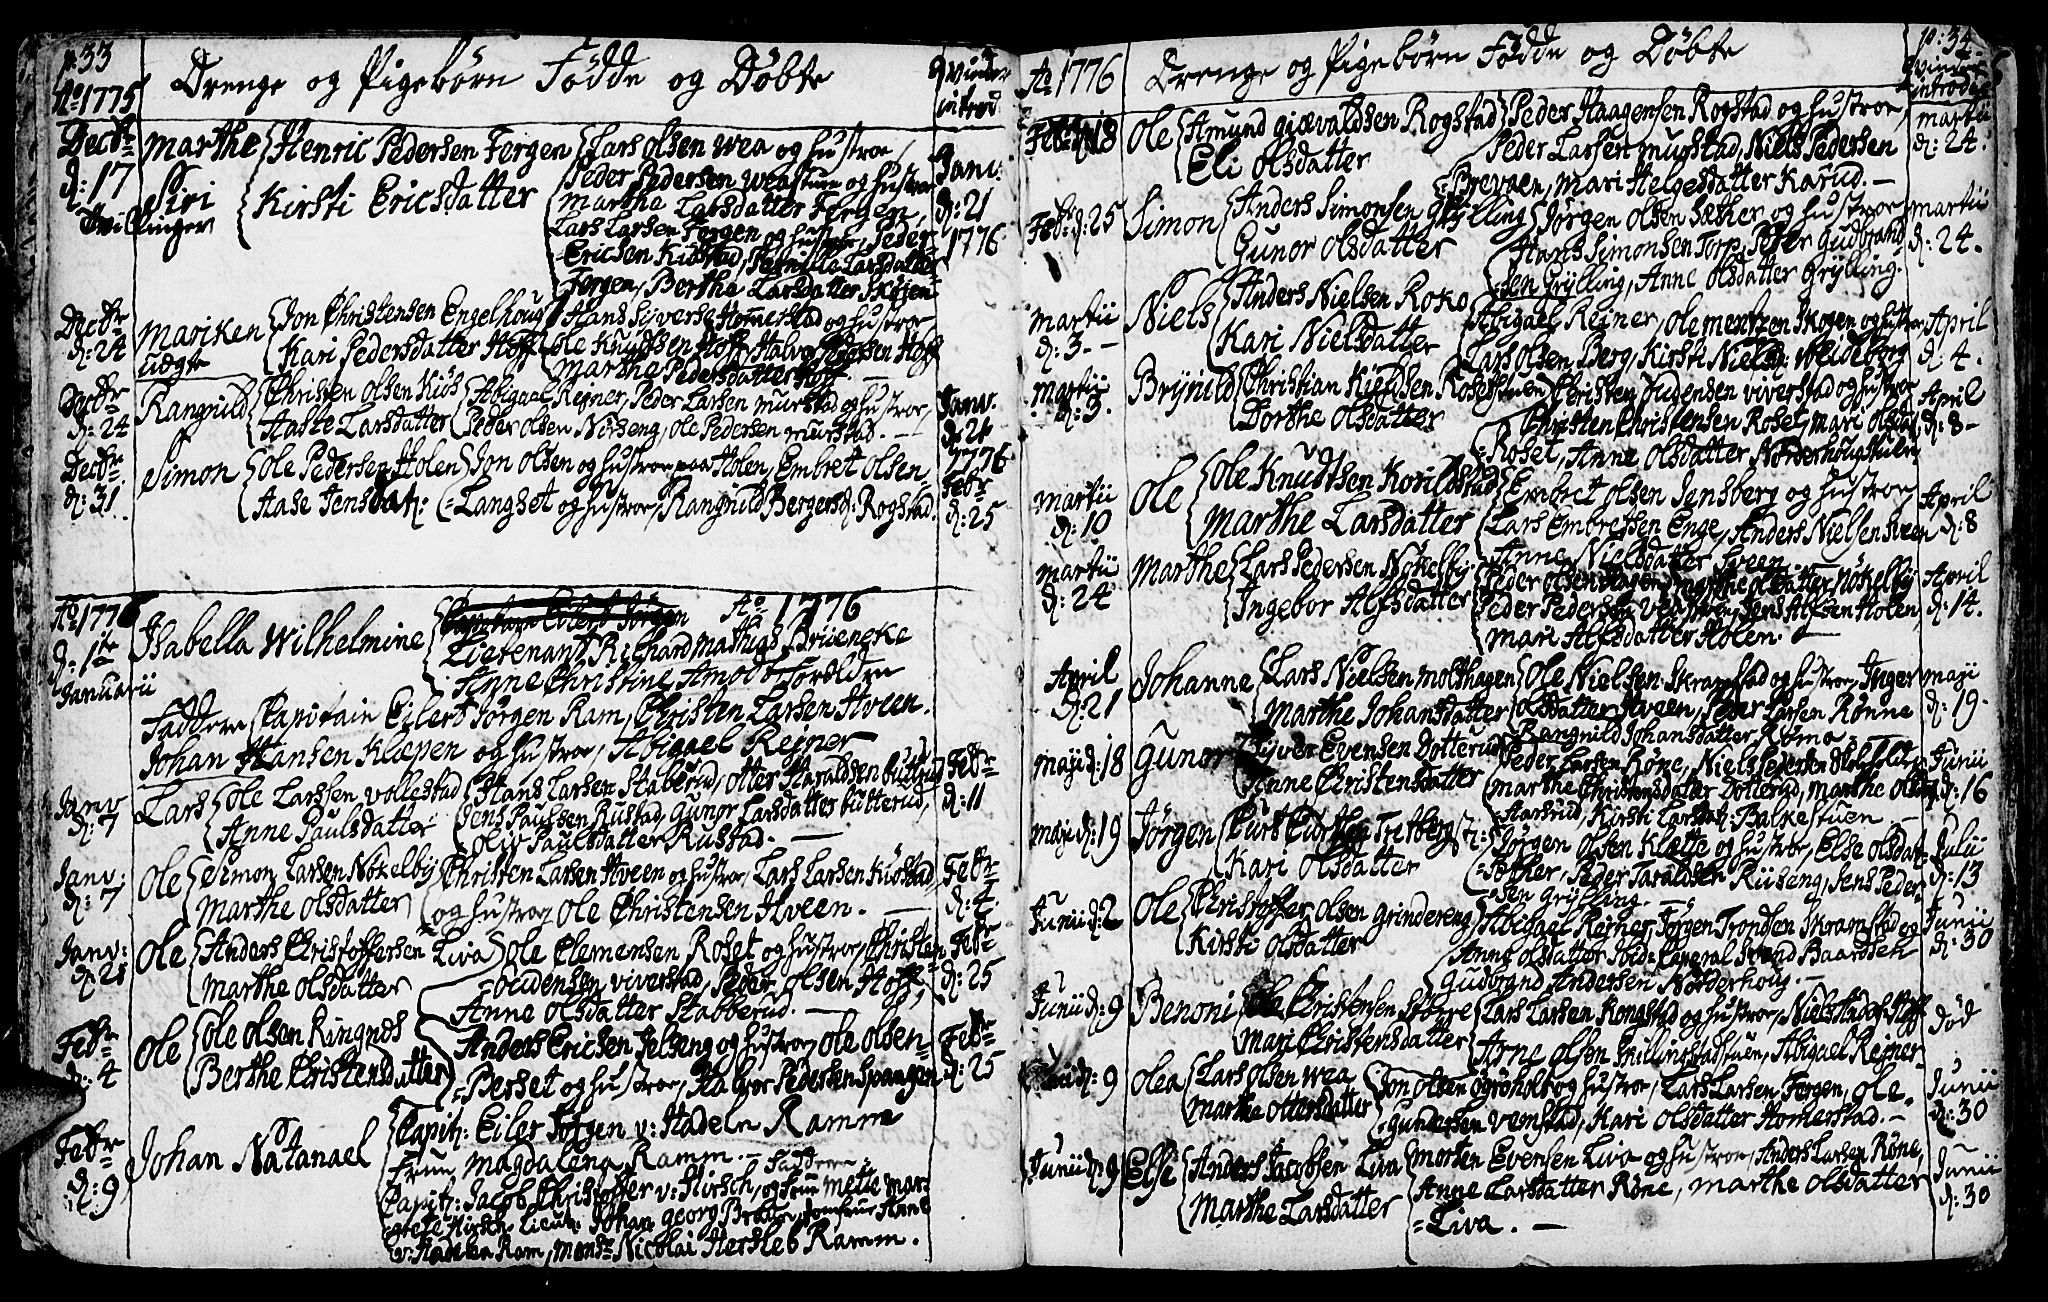 SAH, Løten prestekontor, K/Ka/L0003: Ministerialbok nr. 3, 1773-1800, s. 33-34